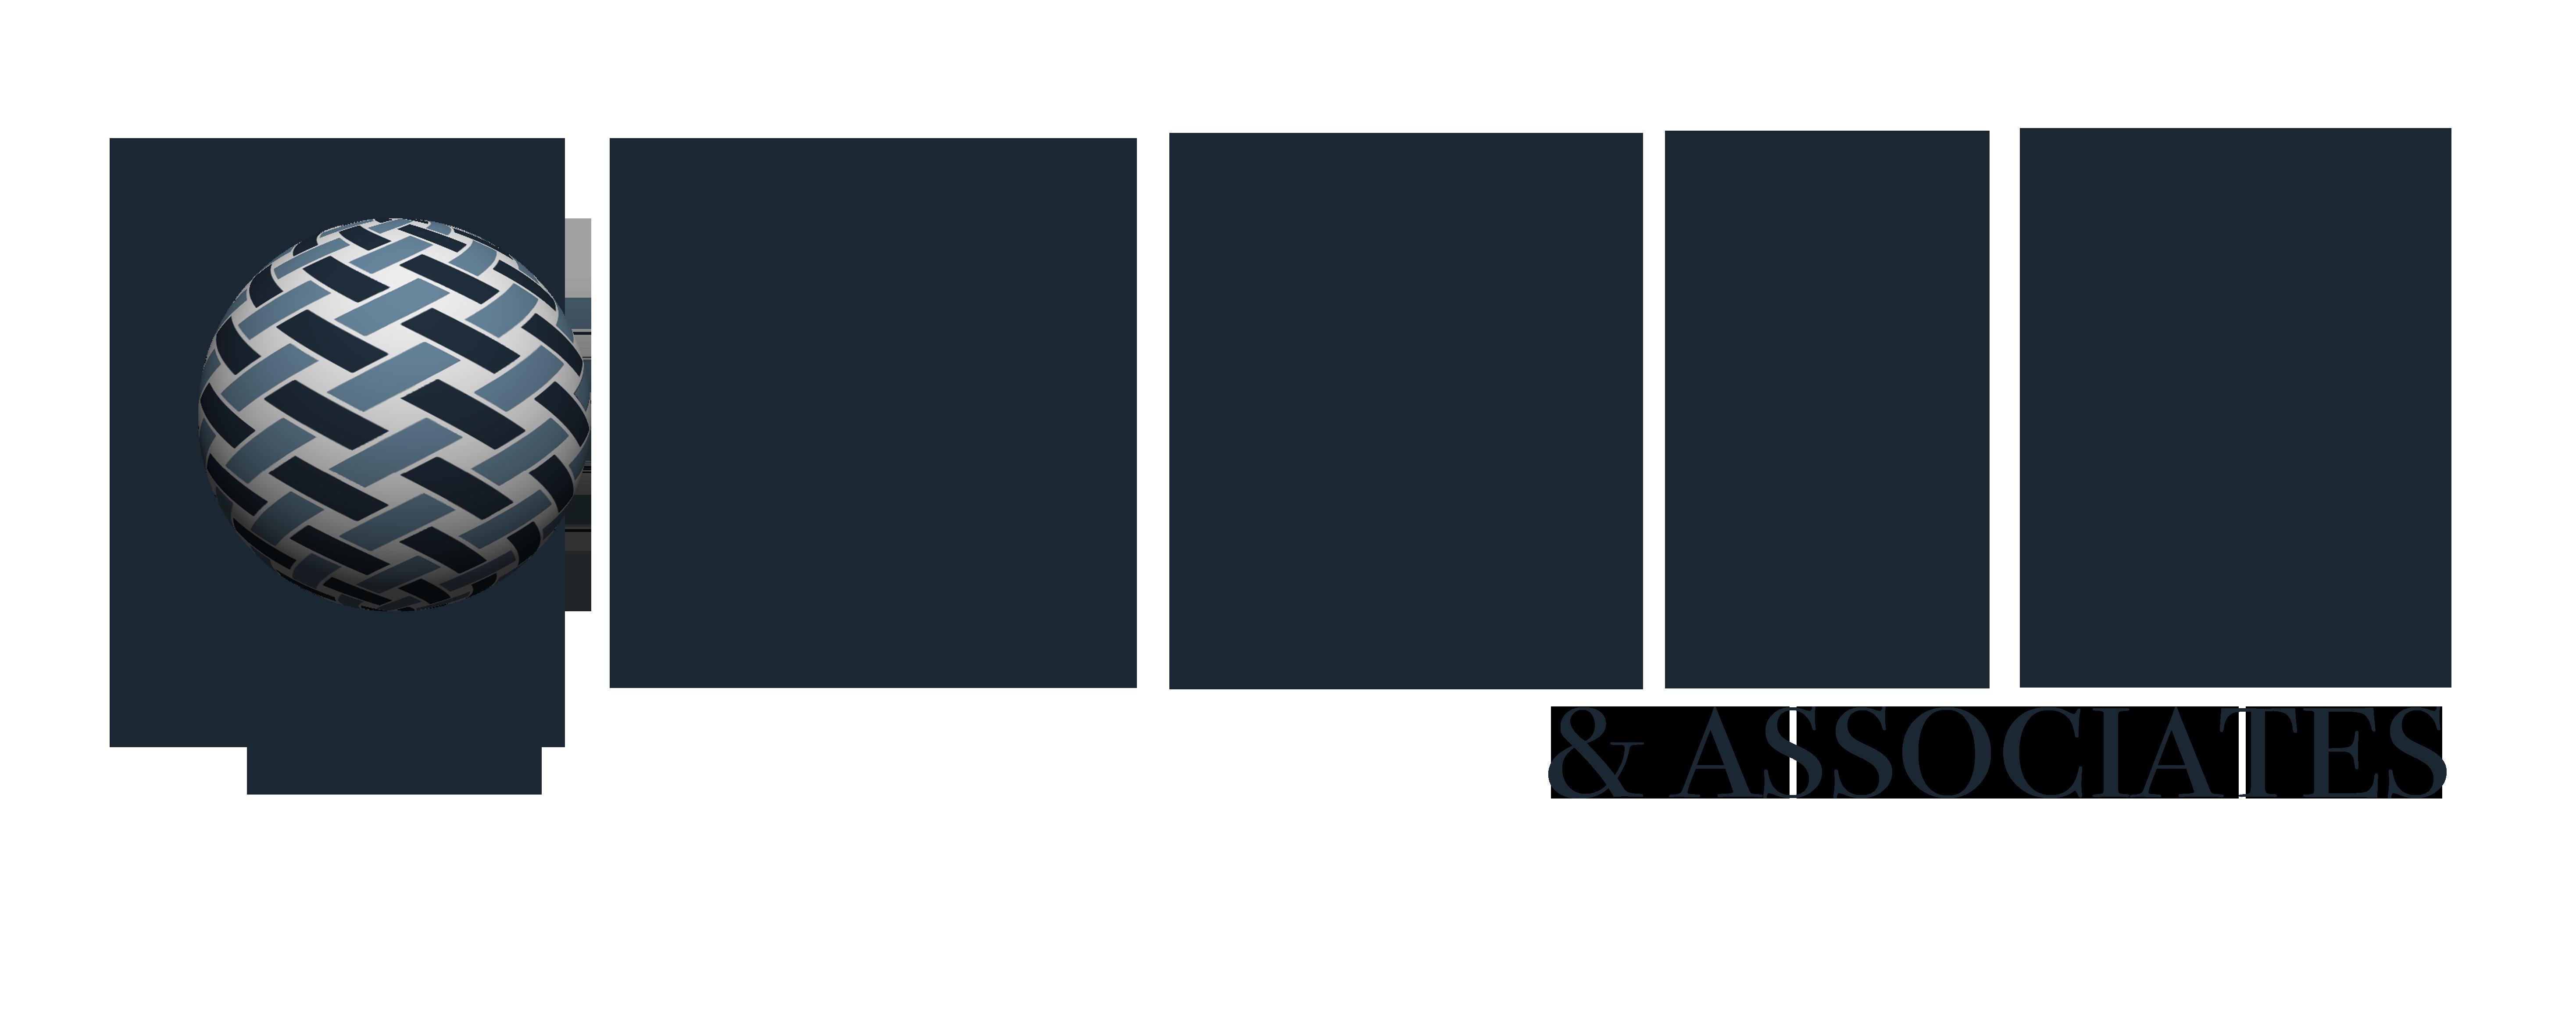 Coker & Associates